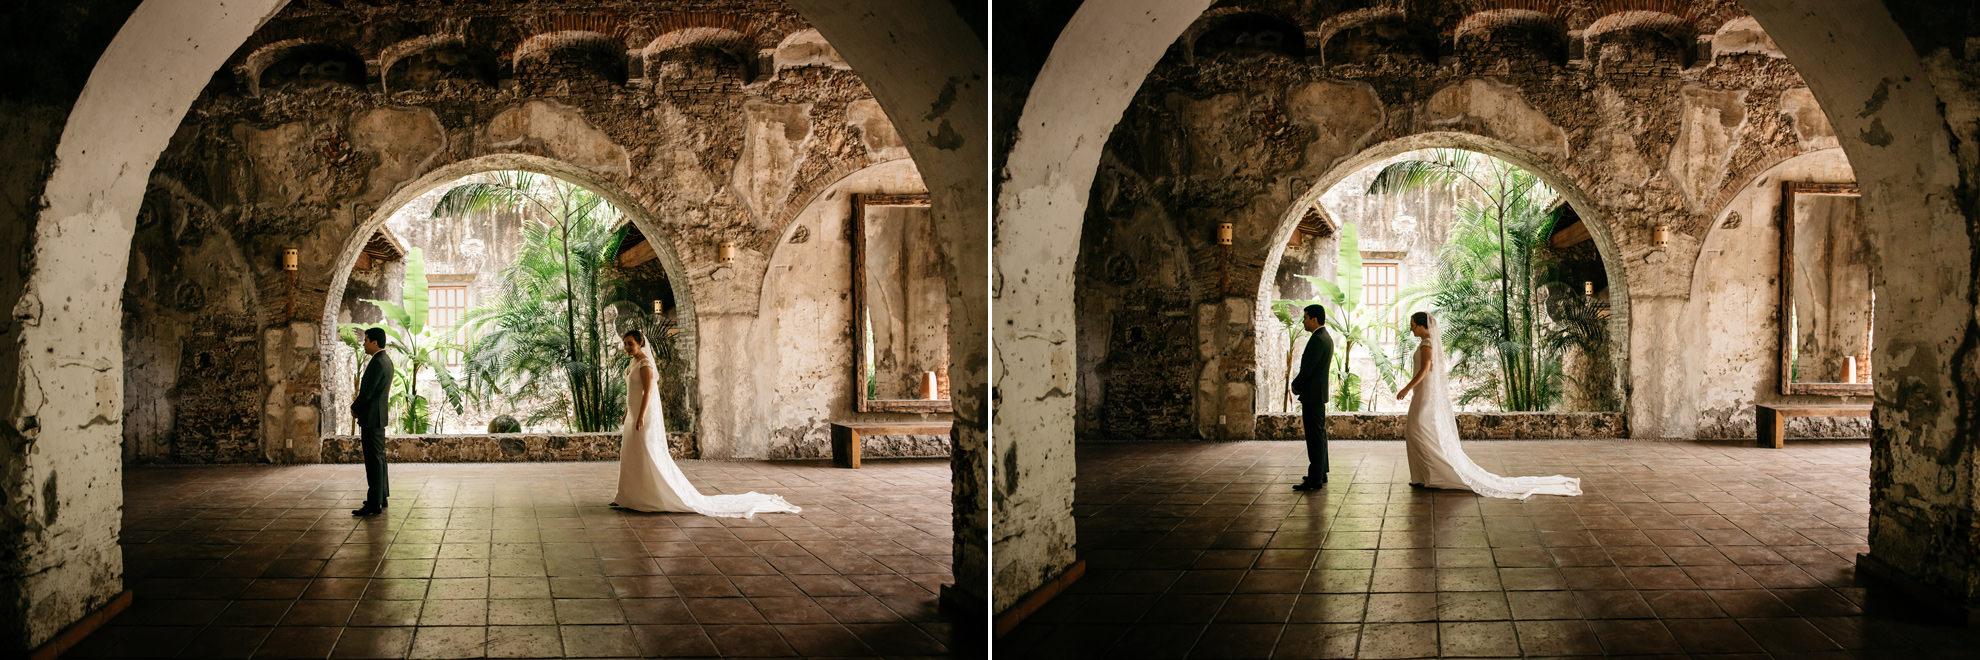 024 - wedding hacienda san carlos.jpg